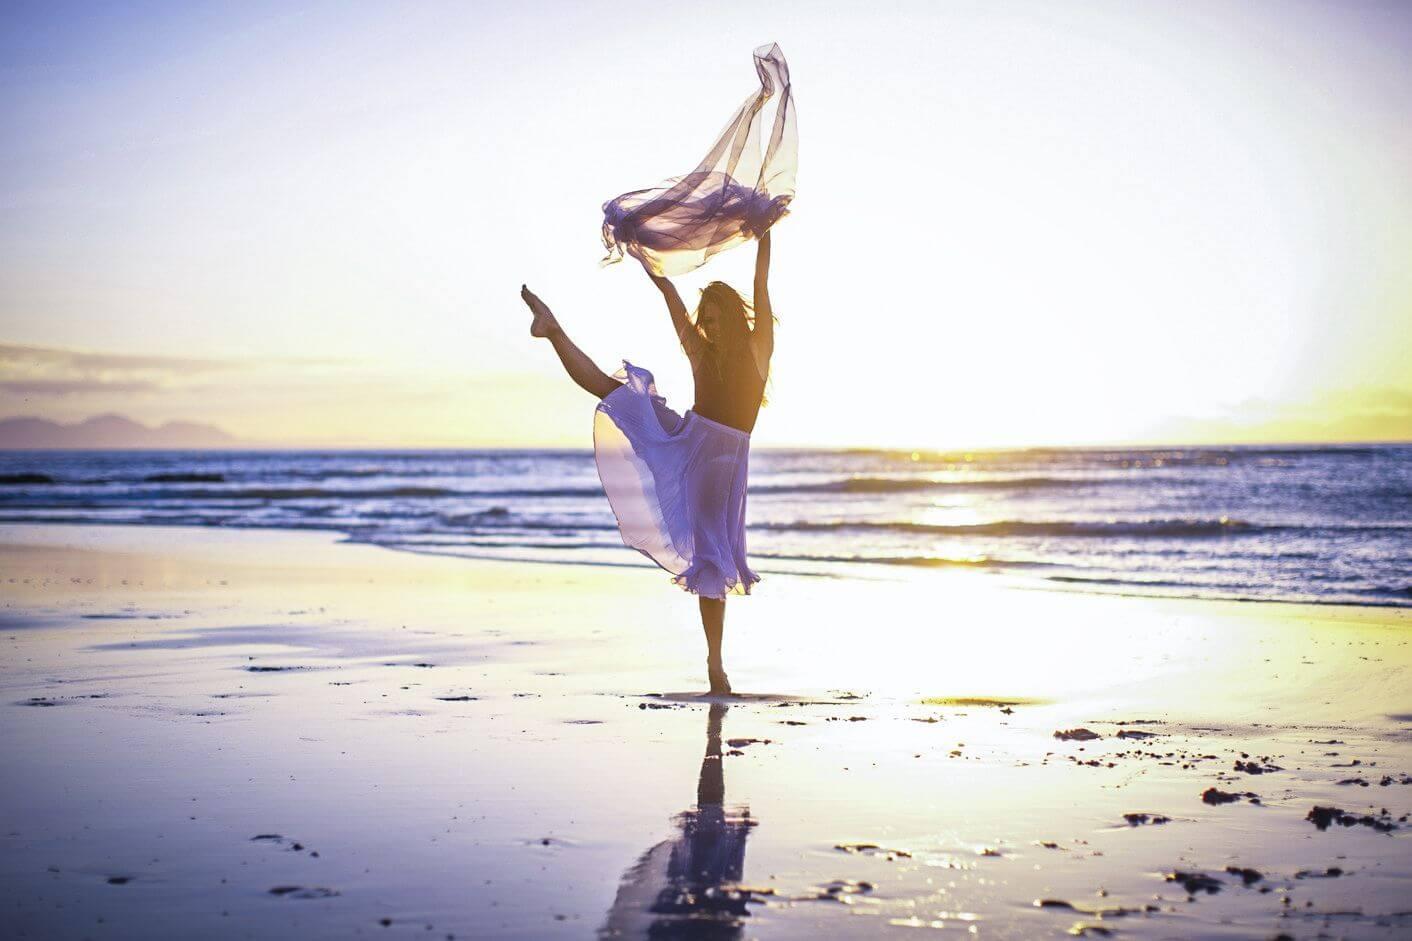 dance-beach-yoga_yogini_present-moment-retreat-boutique-hotel-spa-resort-yoga-retreat-restaurant_playa-troncones-mexico1